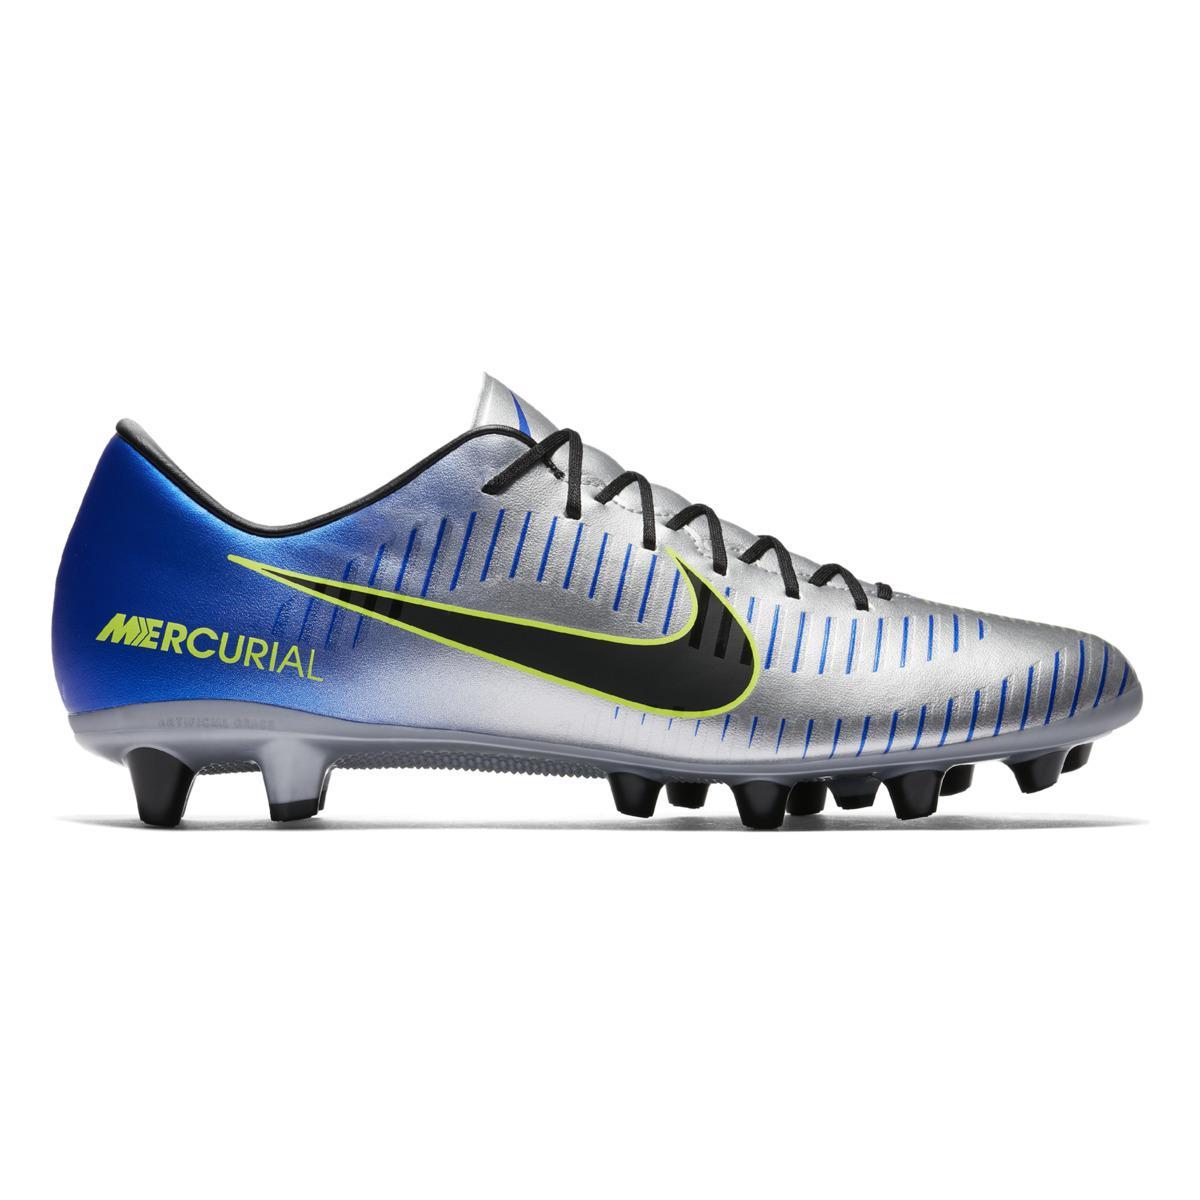 4f36ef24c Nike Neymar Mercurial Victory Vi (ag) Football Boots in Blue for Men ...